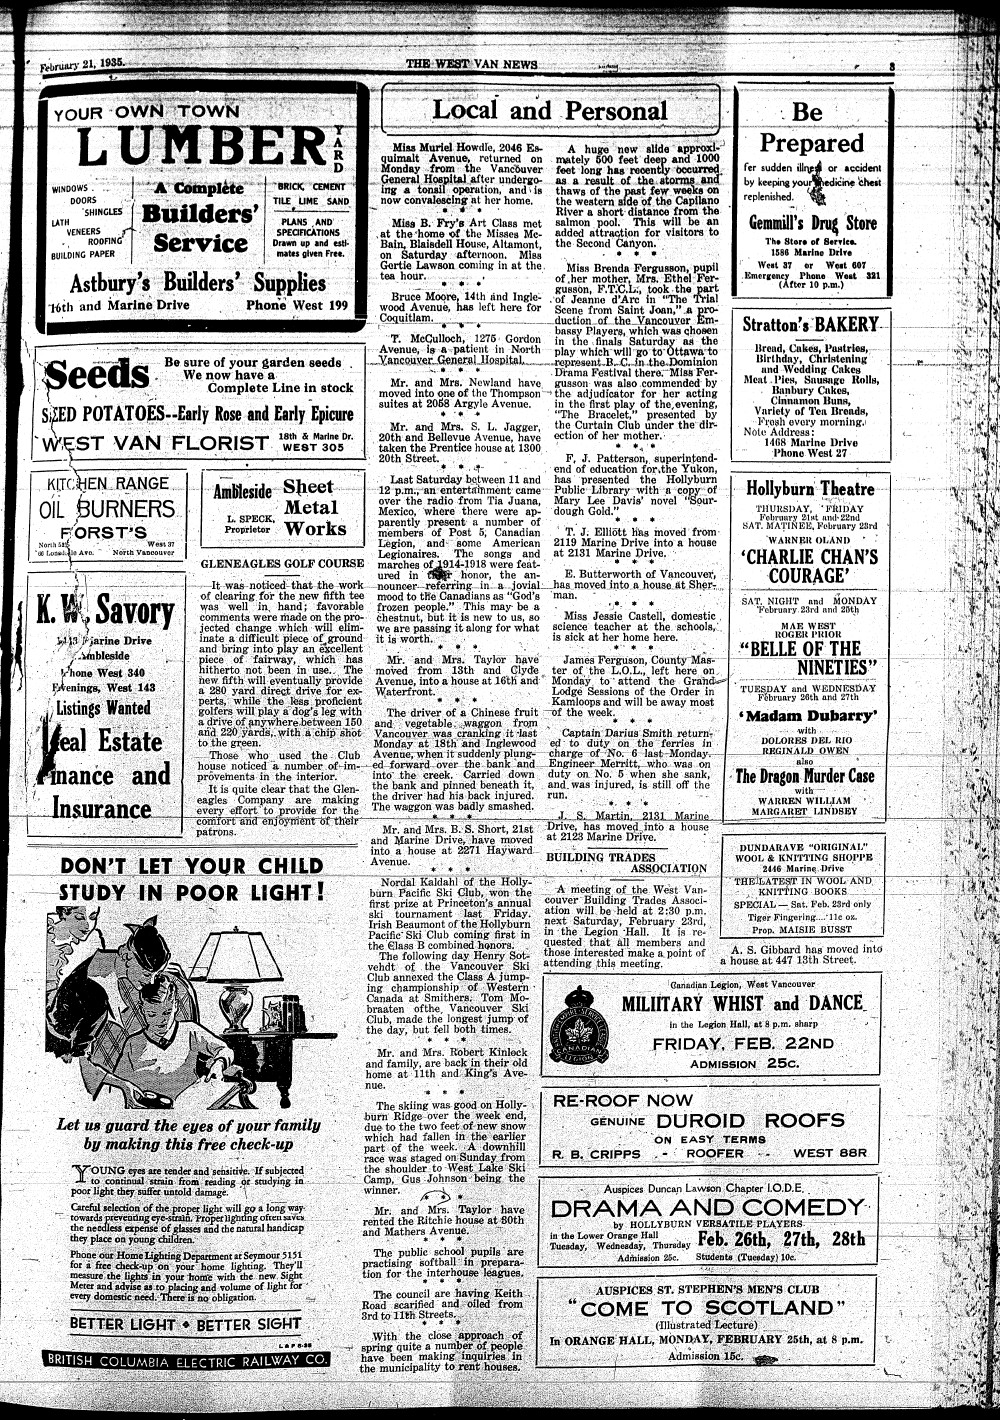 West Van. News (West Vancouver), 21 Feb 1935